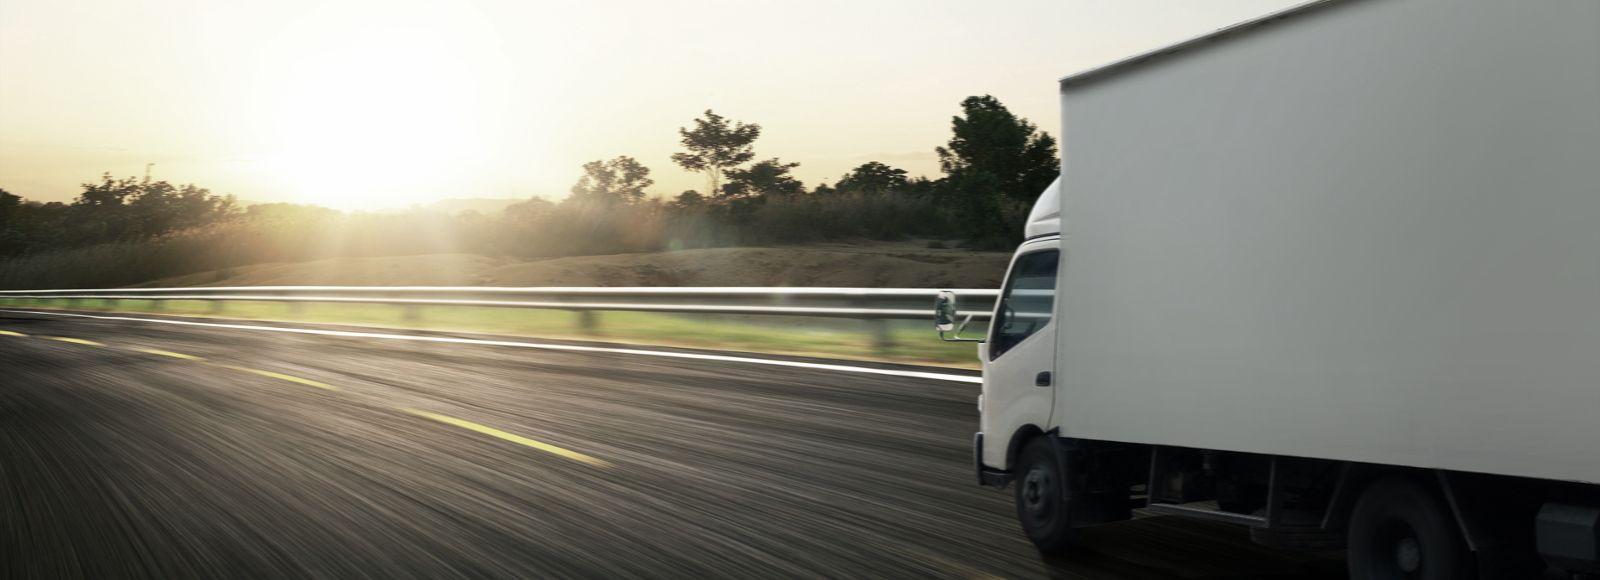 spedizioni espresse corriere espresso mercurio campobasso molise furgone